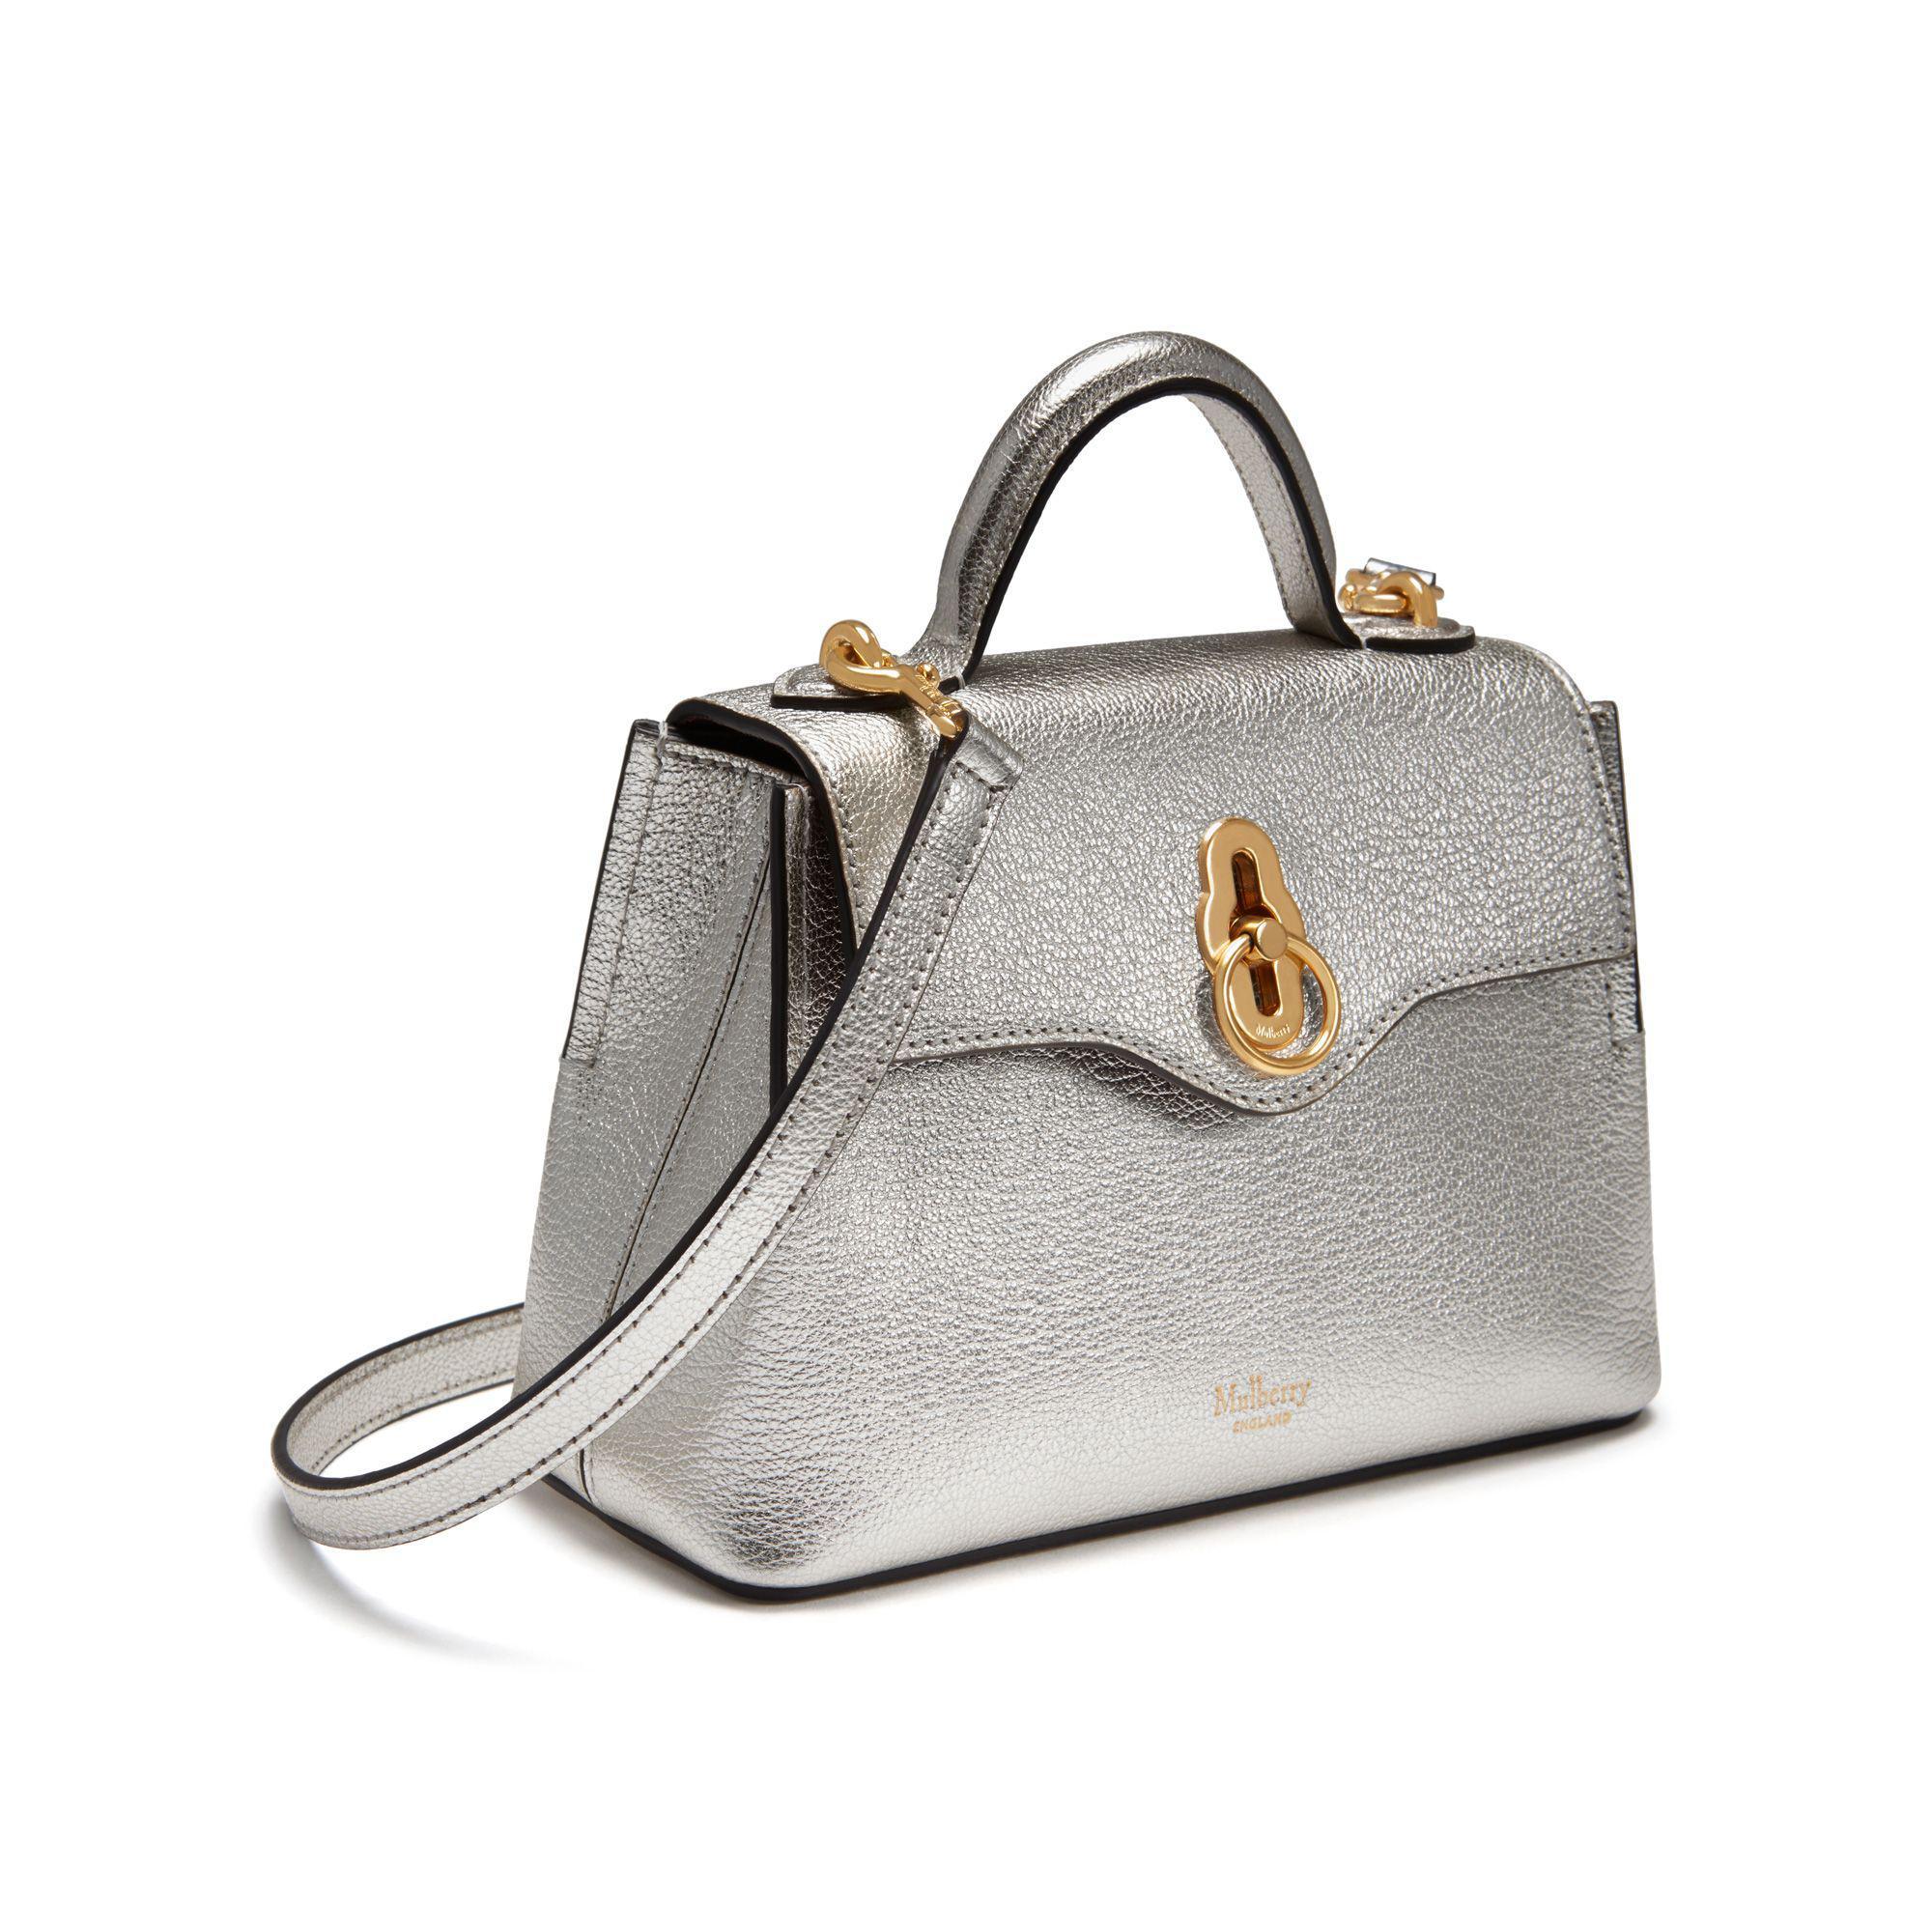 c5f6b1e94696 Gallery. Women s Micro Bags Women s Prada Cross Body ...